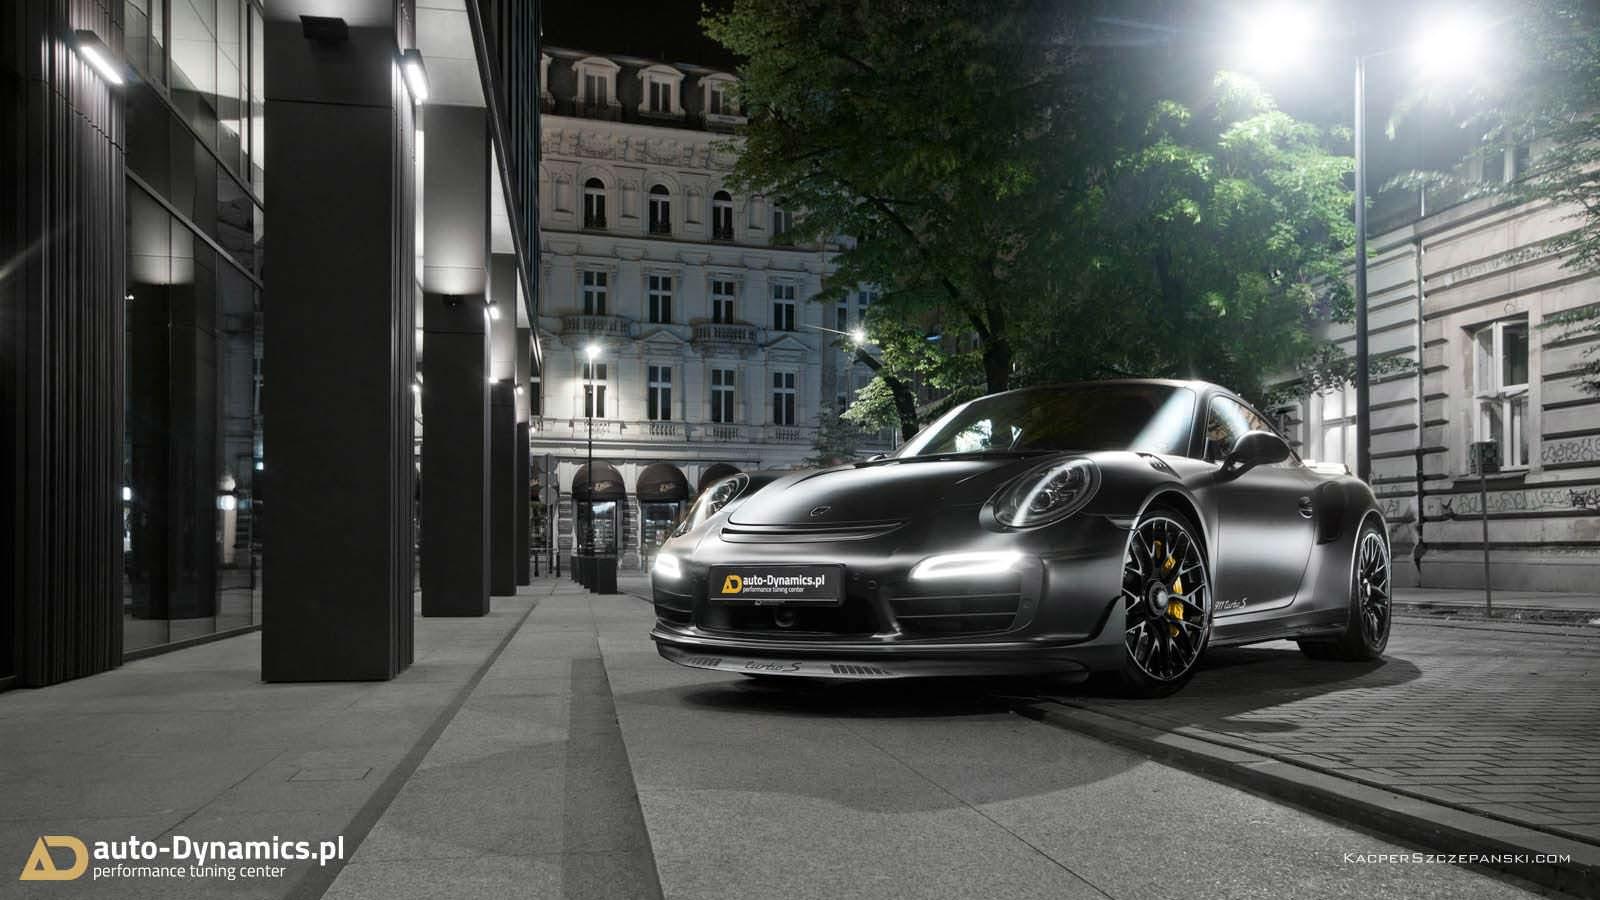 Польский тюнинг Dark Knight 911 Turbo S